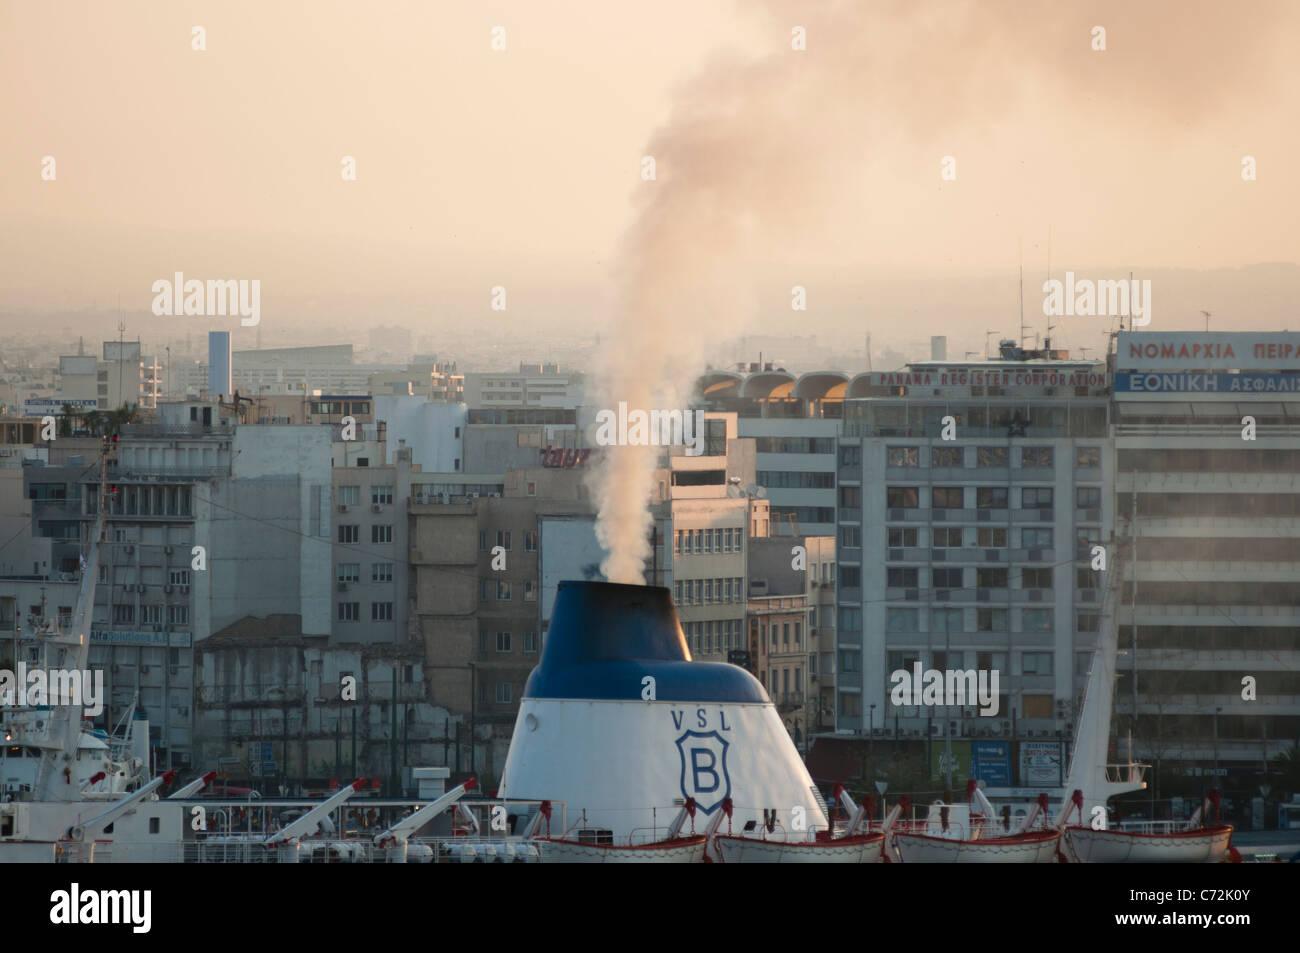 Ship's funnel at Piraeus, Athens, Greece. - Stock Image